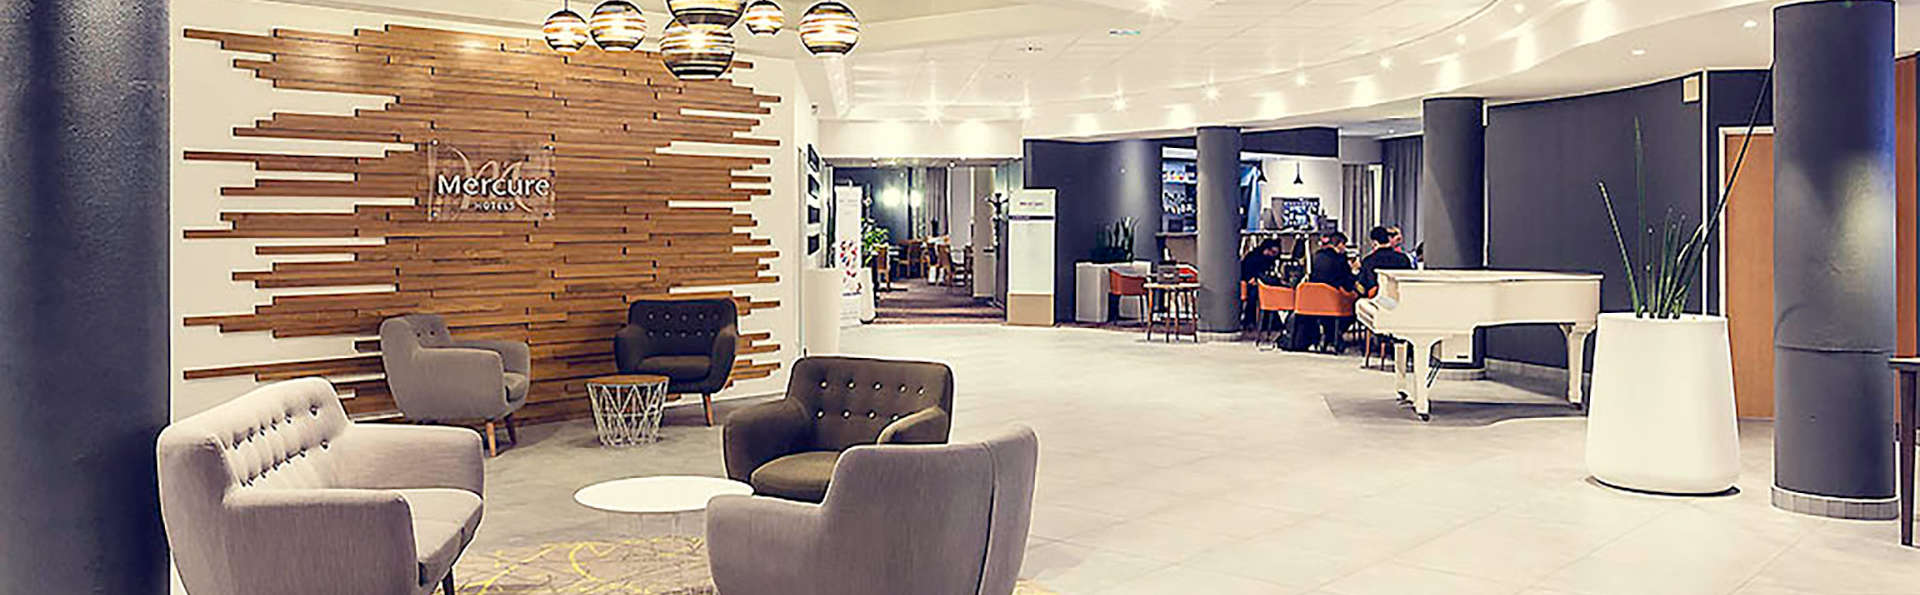 Hôtel Mercure Compiègne Sud - EDIT_lobby.jpg